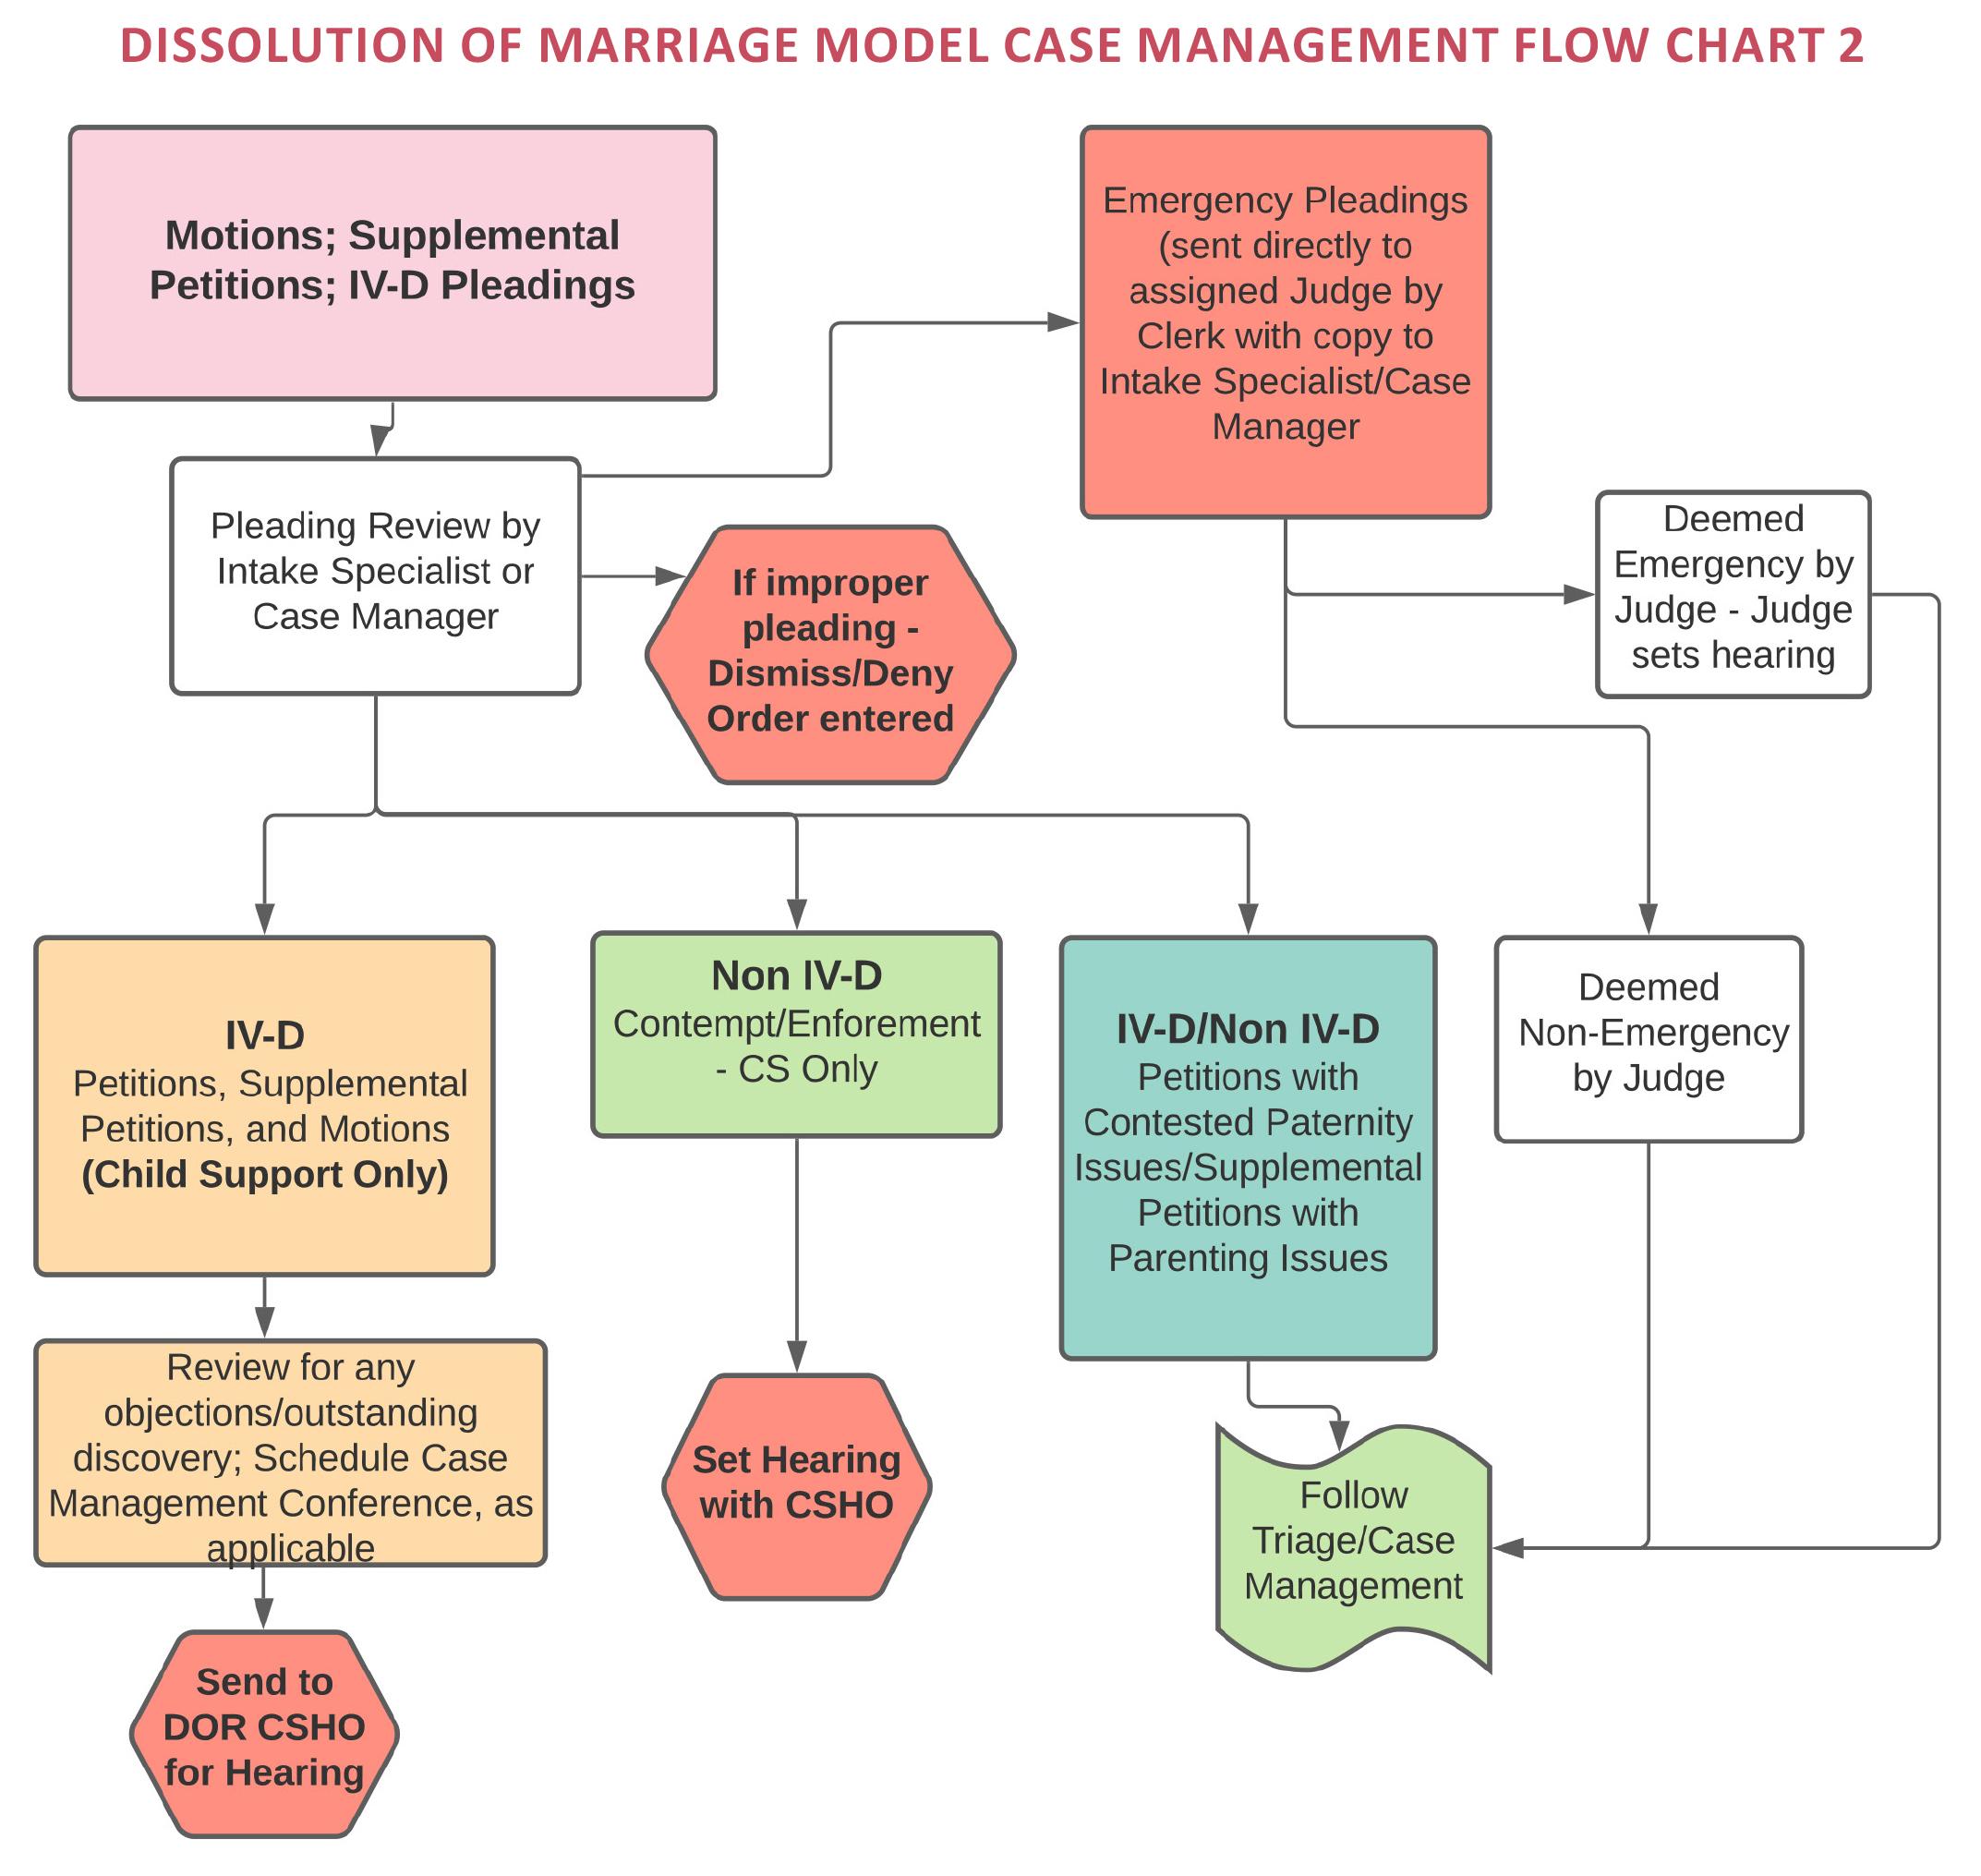 Dissolution of Marriage Model Case Management Flow Chart 2